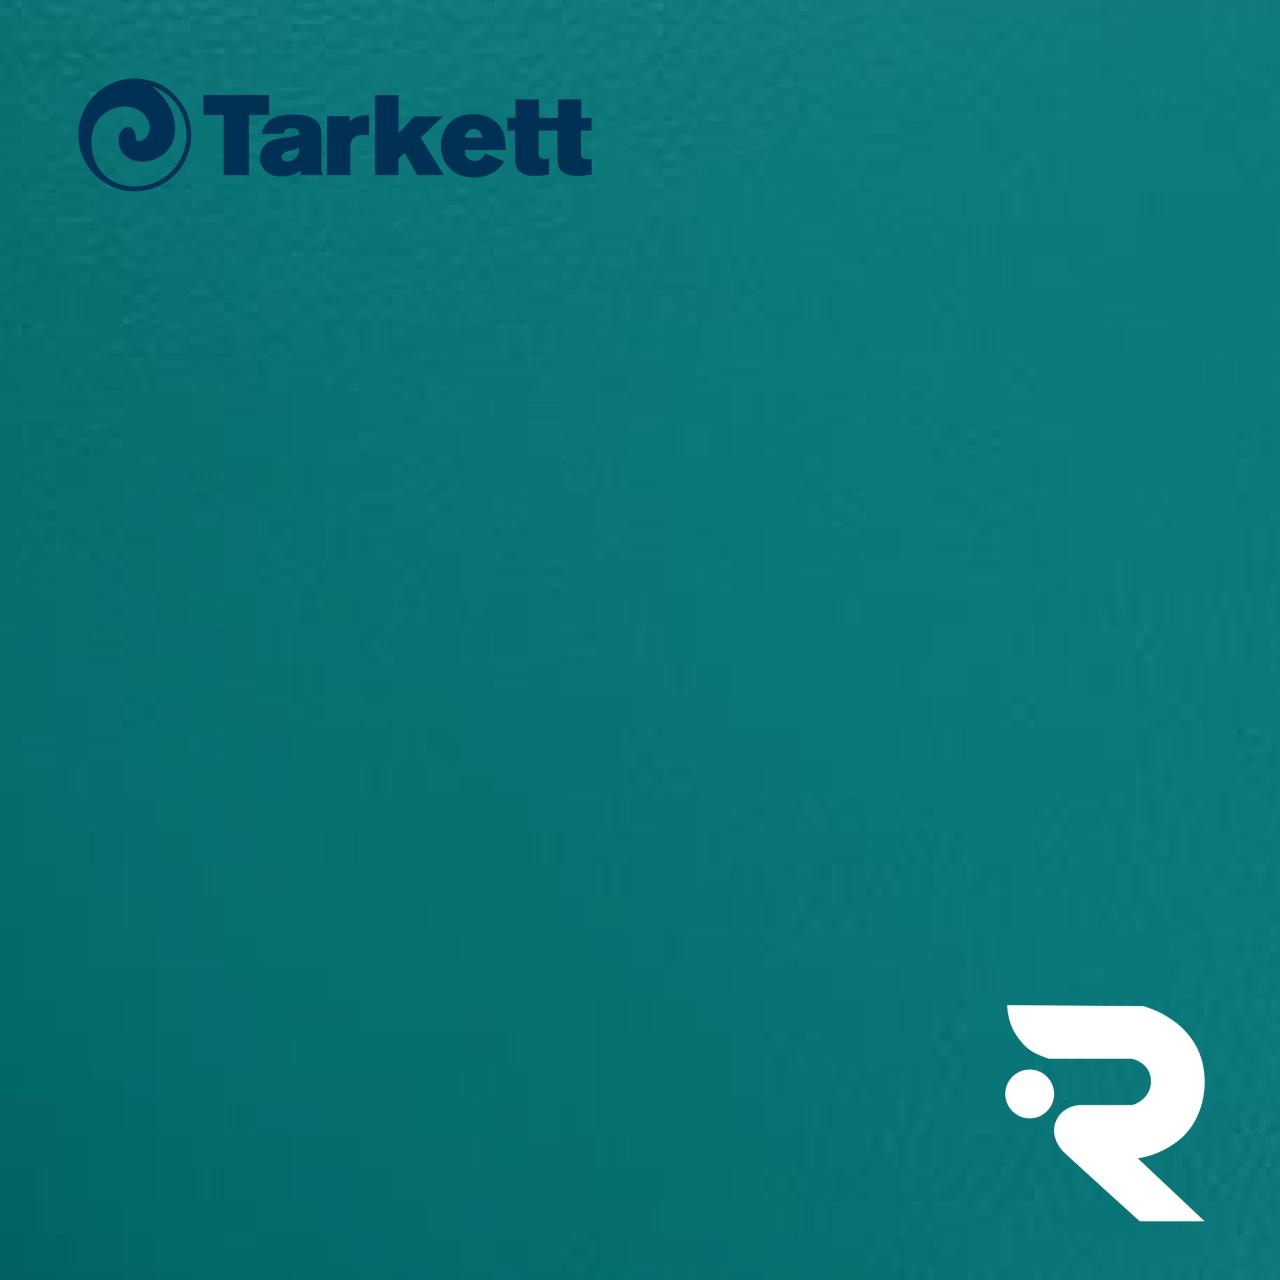 🏐 Спортивное покрытие Tarkett   TEAL   OMNISPORTS V35   2 х 20.5 м